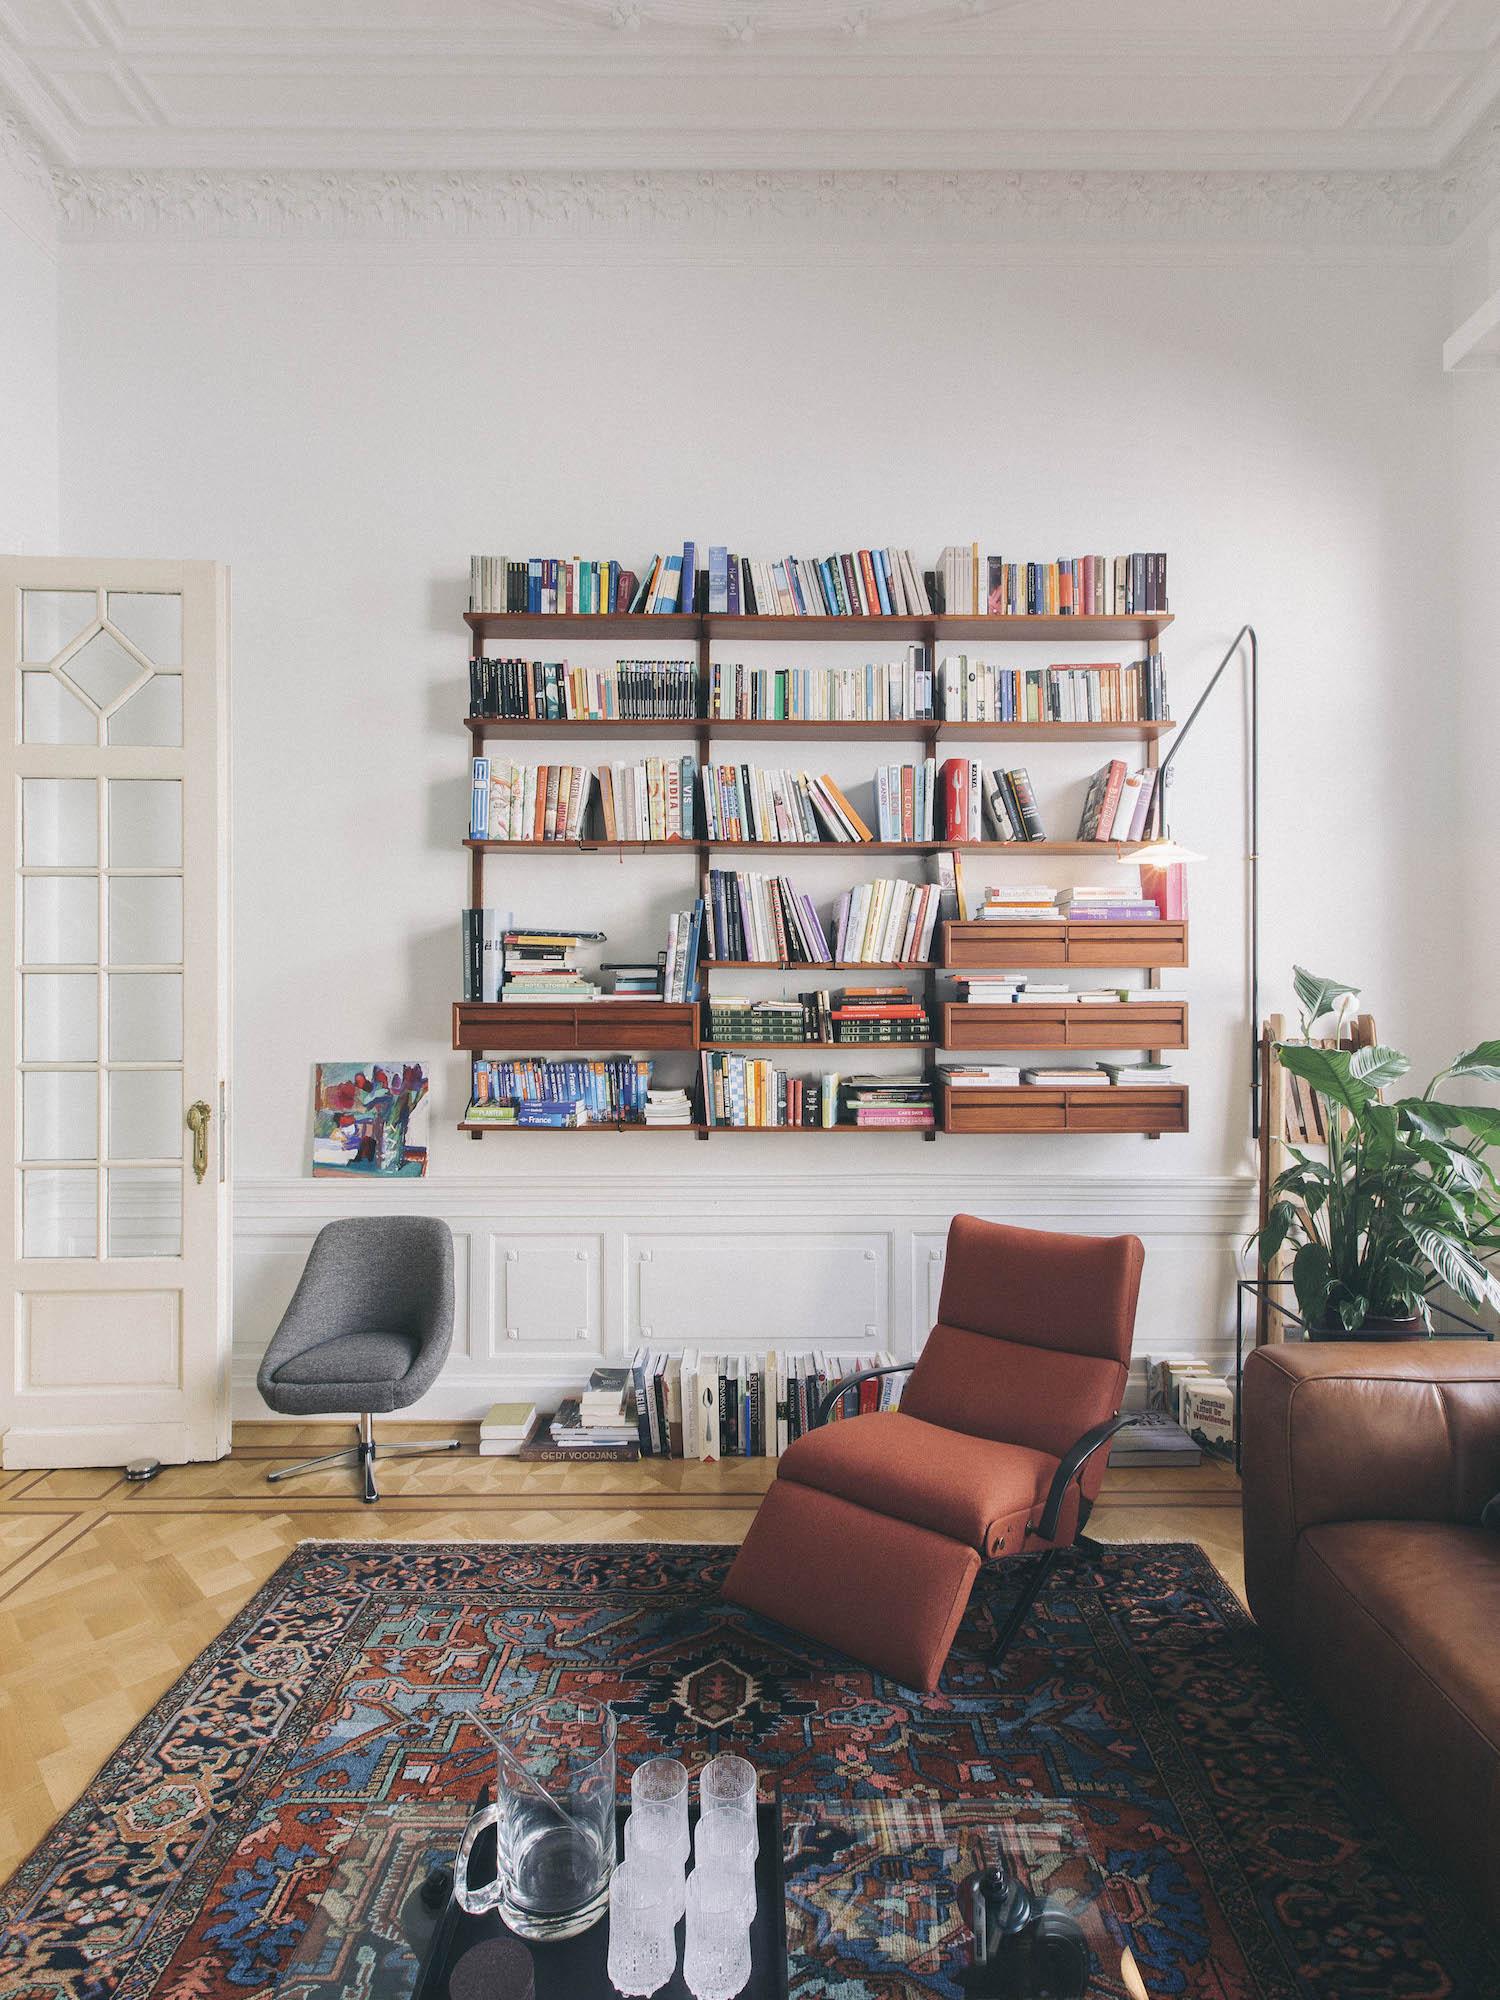 My Space | Tim Van Steenbergen